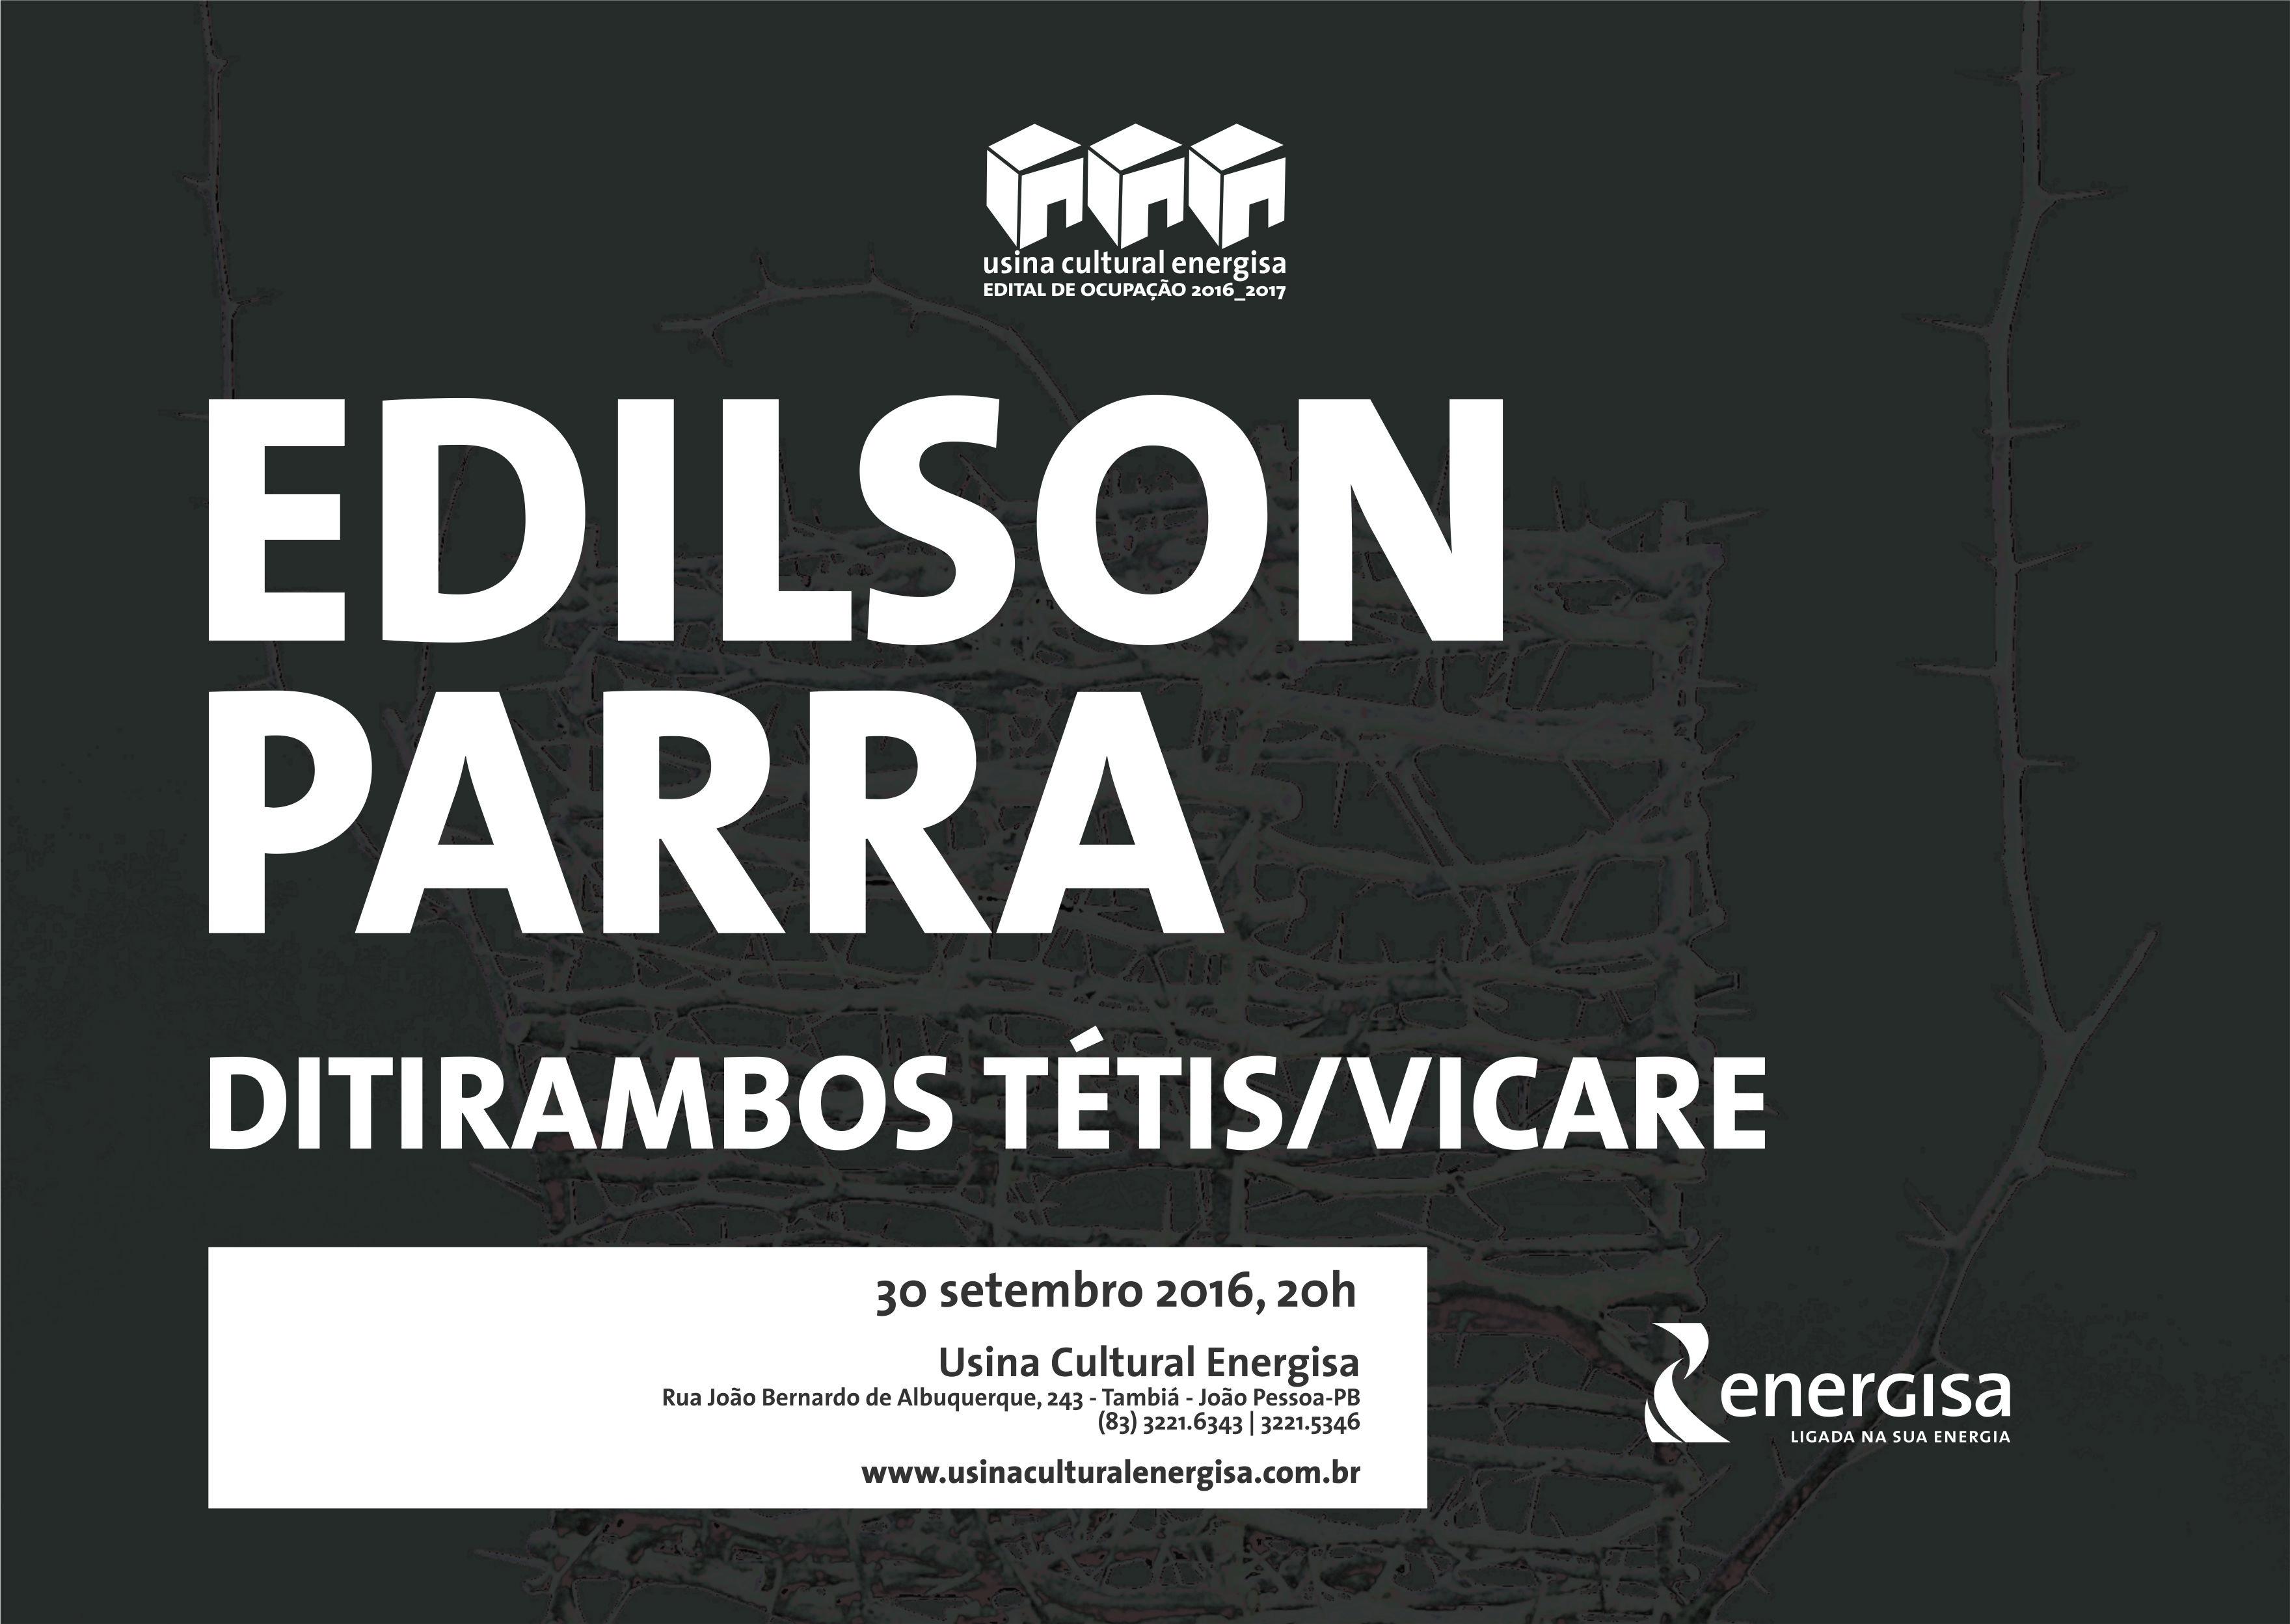 Ditirambos Tétis/Vicare, mostra individual do artista paraibano Edilson Parra